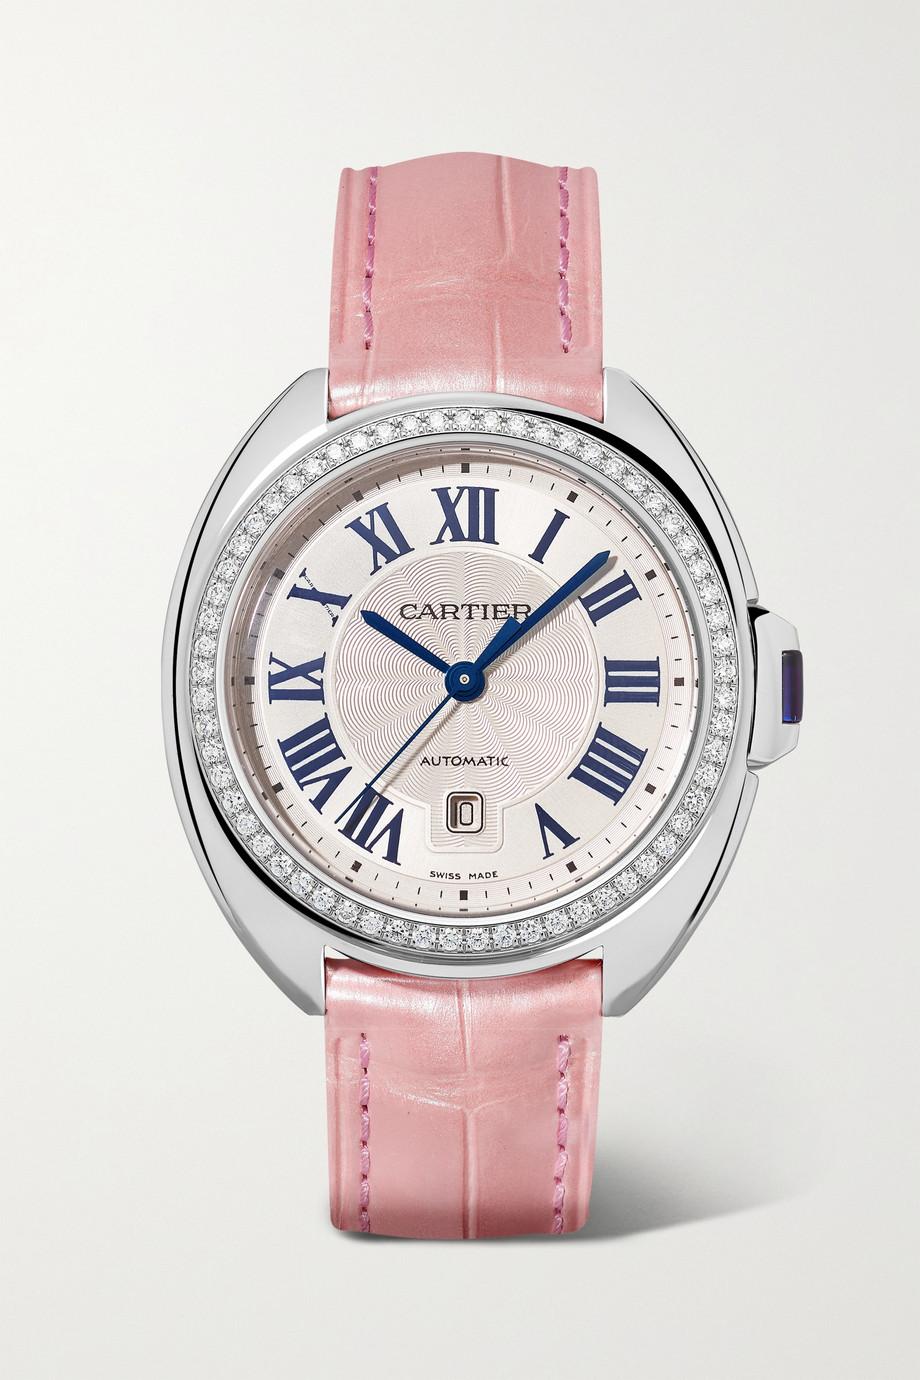 Cartier Clé de Cartier Automatic 34,11 mm Uhr aus Edelstahl mit Diamanten und Alligatorlederarmband